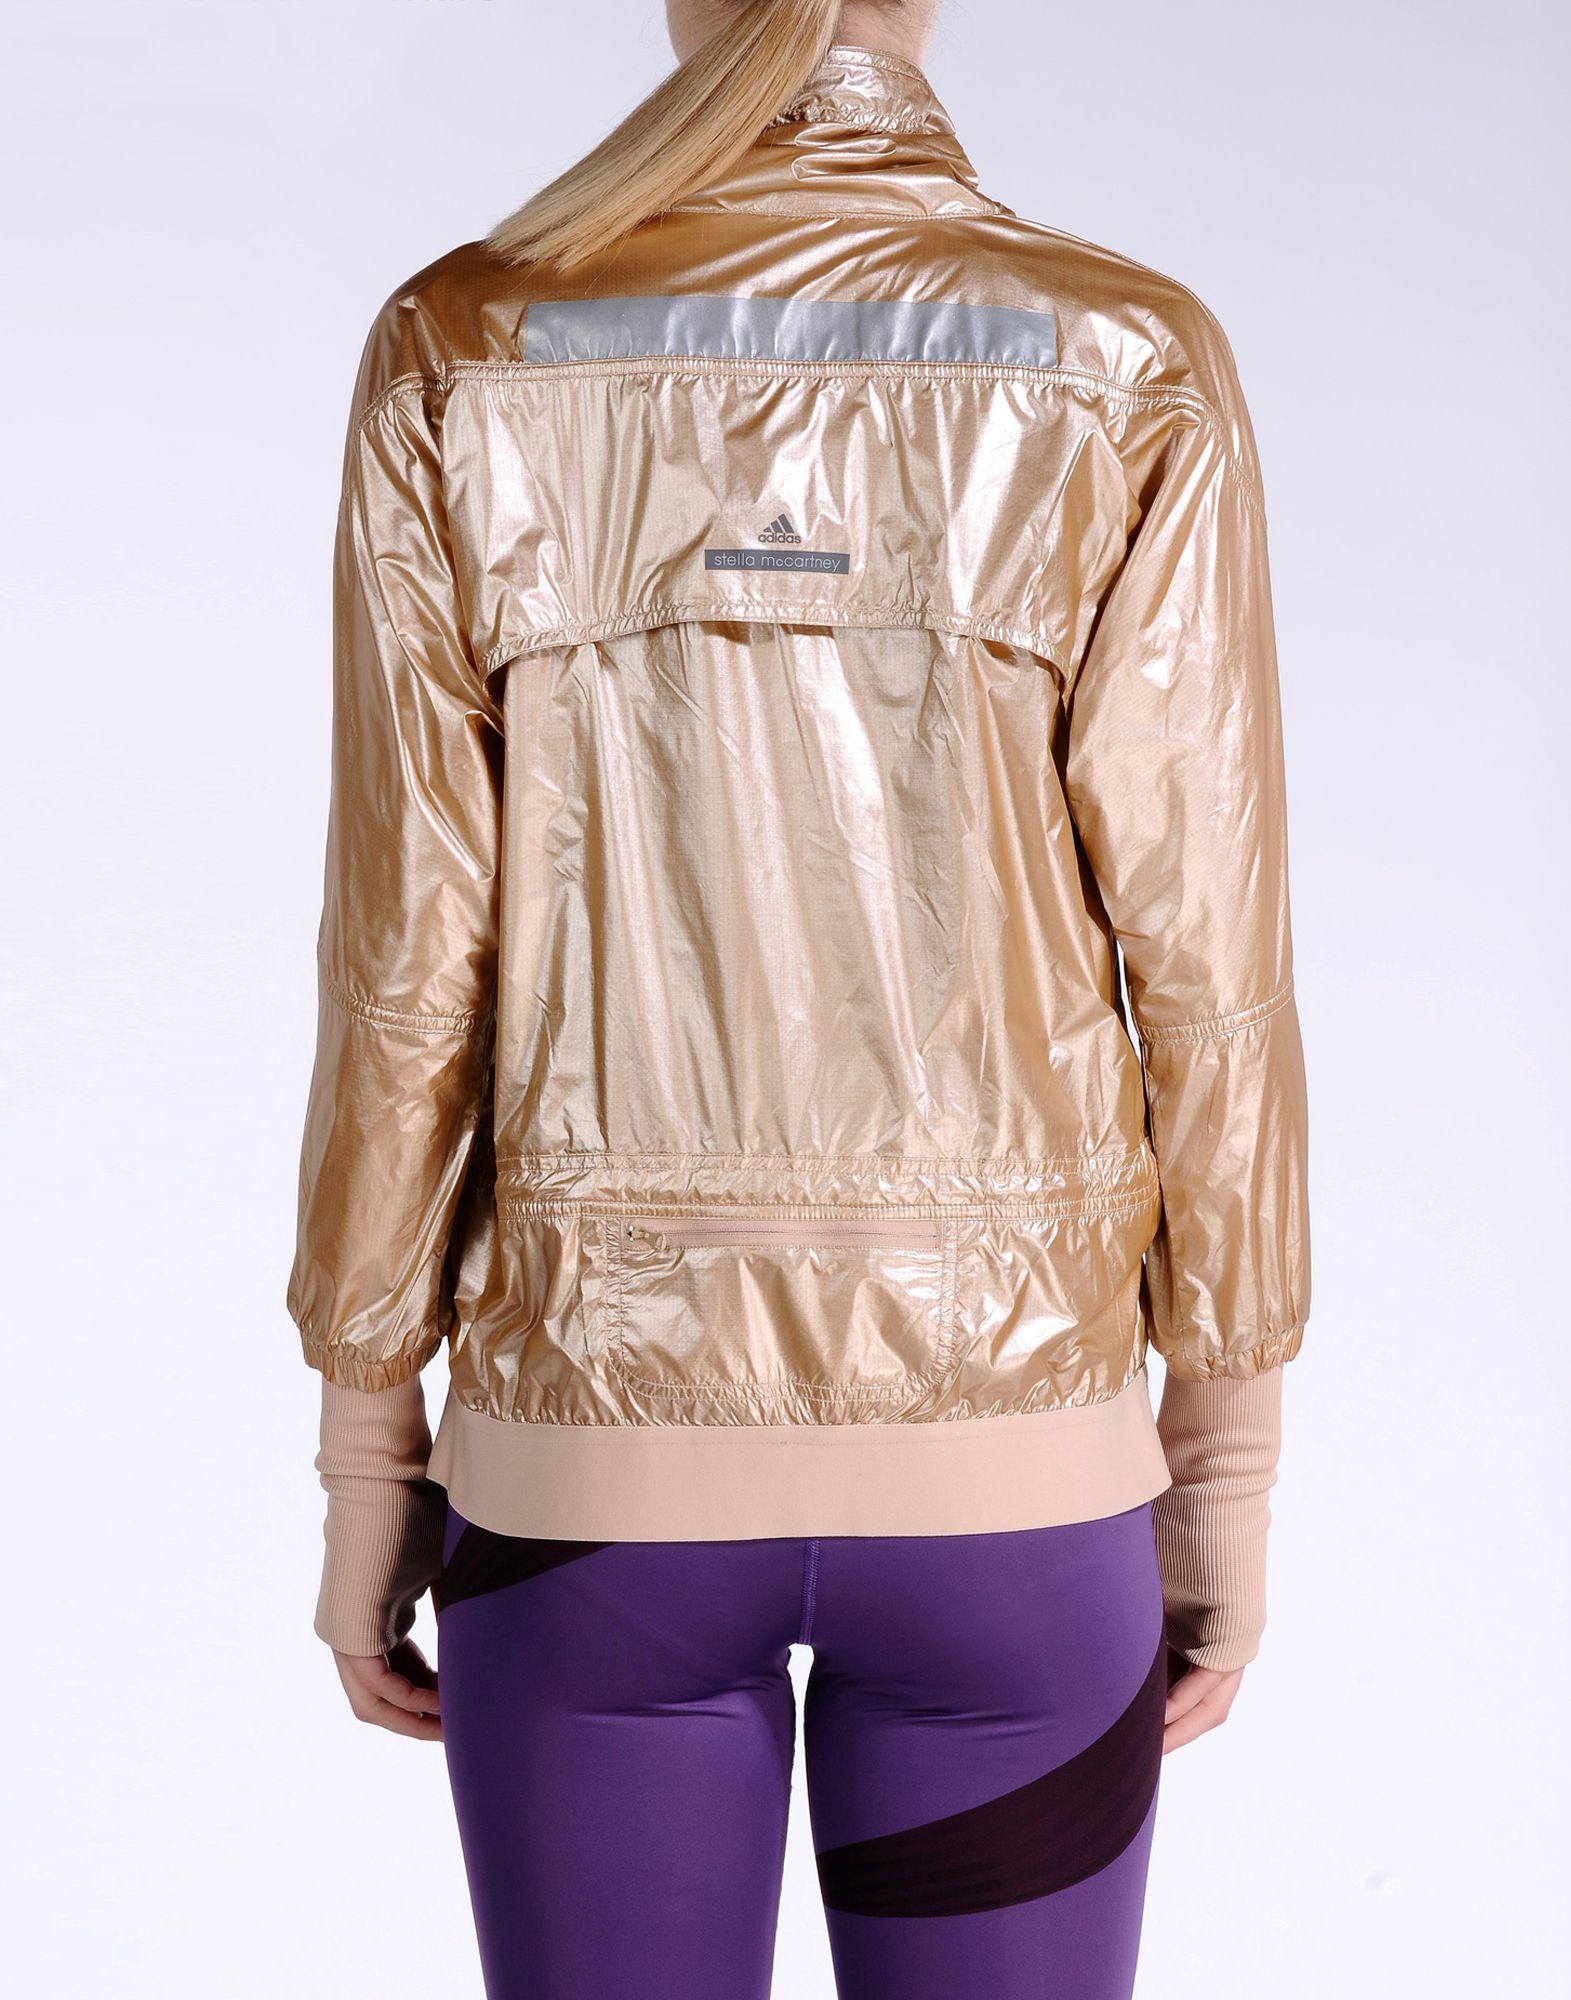 Adidas by stella mccartney run metal jacket 3